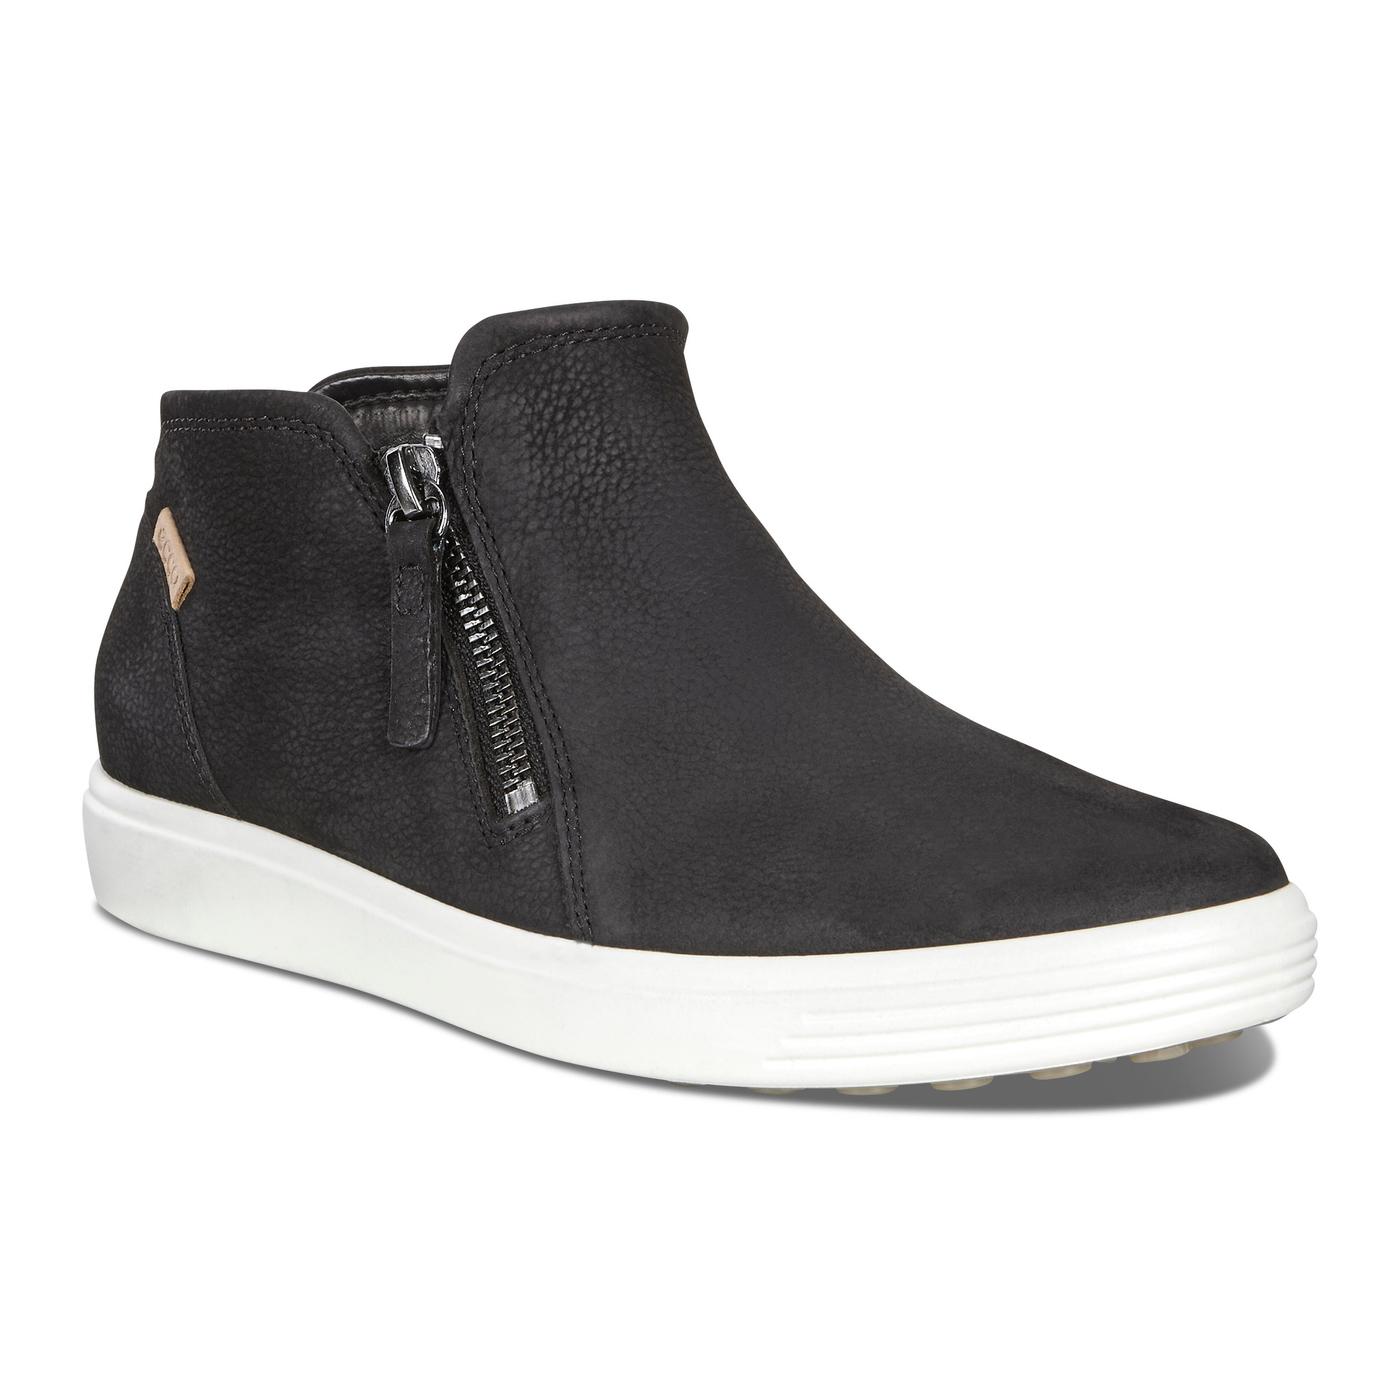 Soft 7 Low Bootie Black/Powder Leather